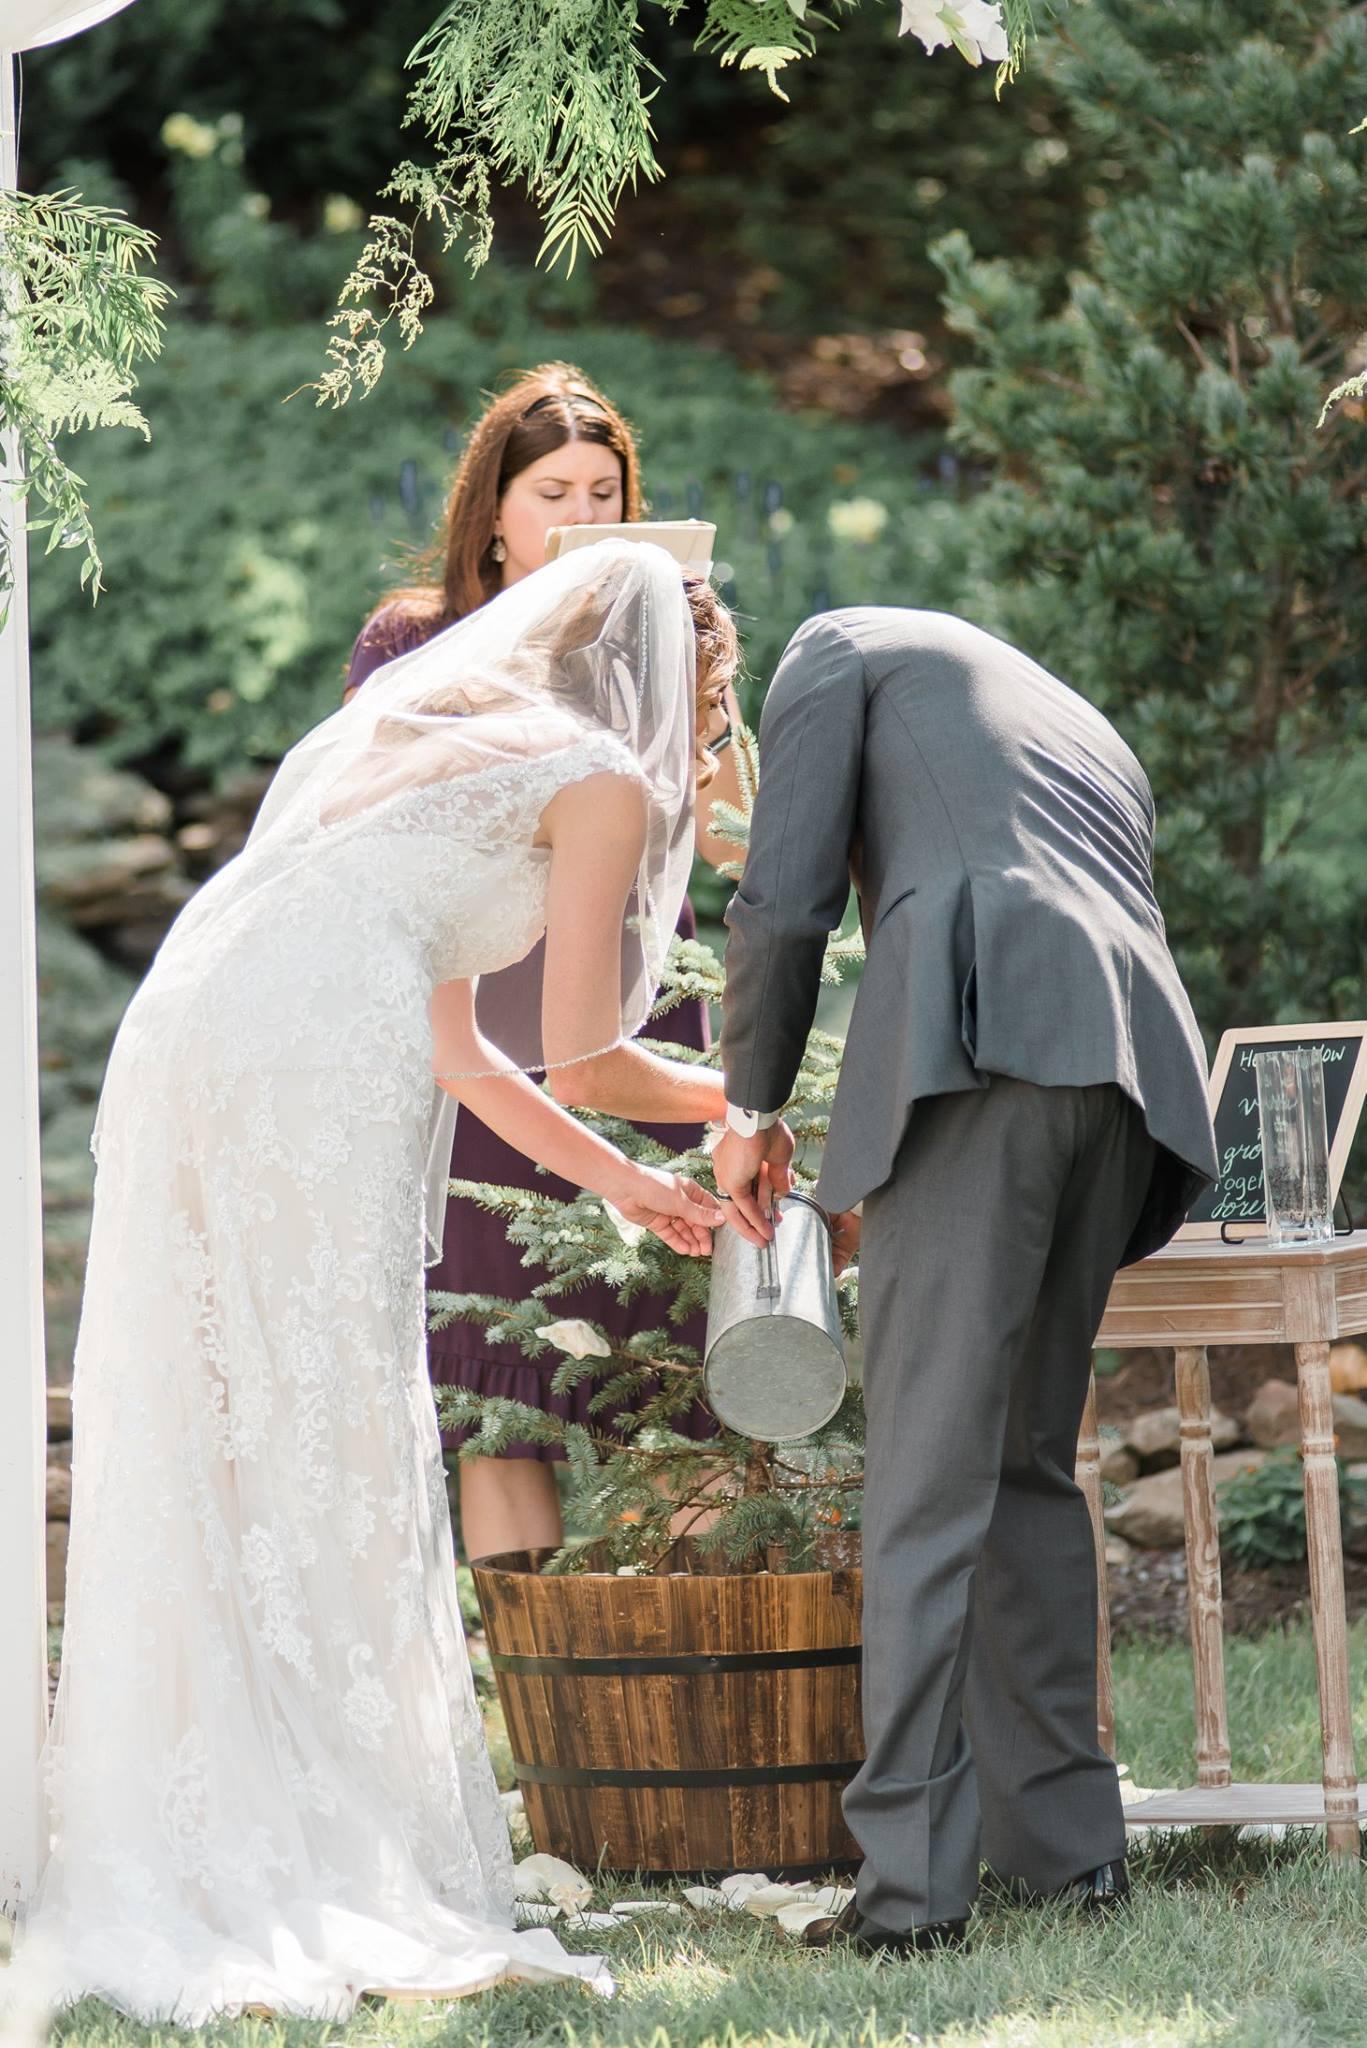 gardens-at-stonebridge-wedding-pittsburgh-classic-outdoor-pennsylvania-0018.jpg